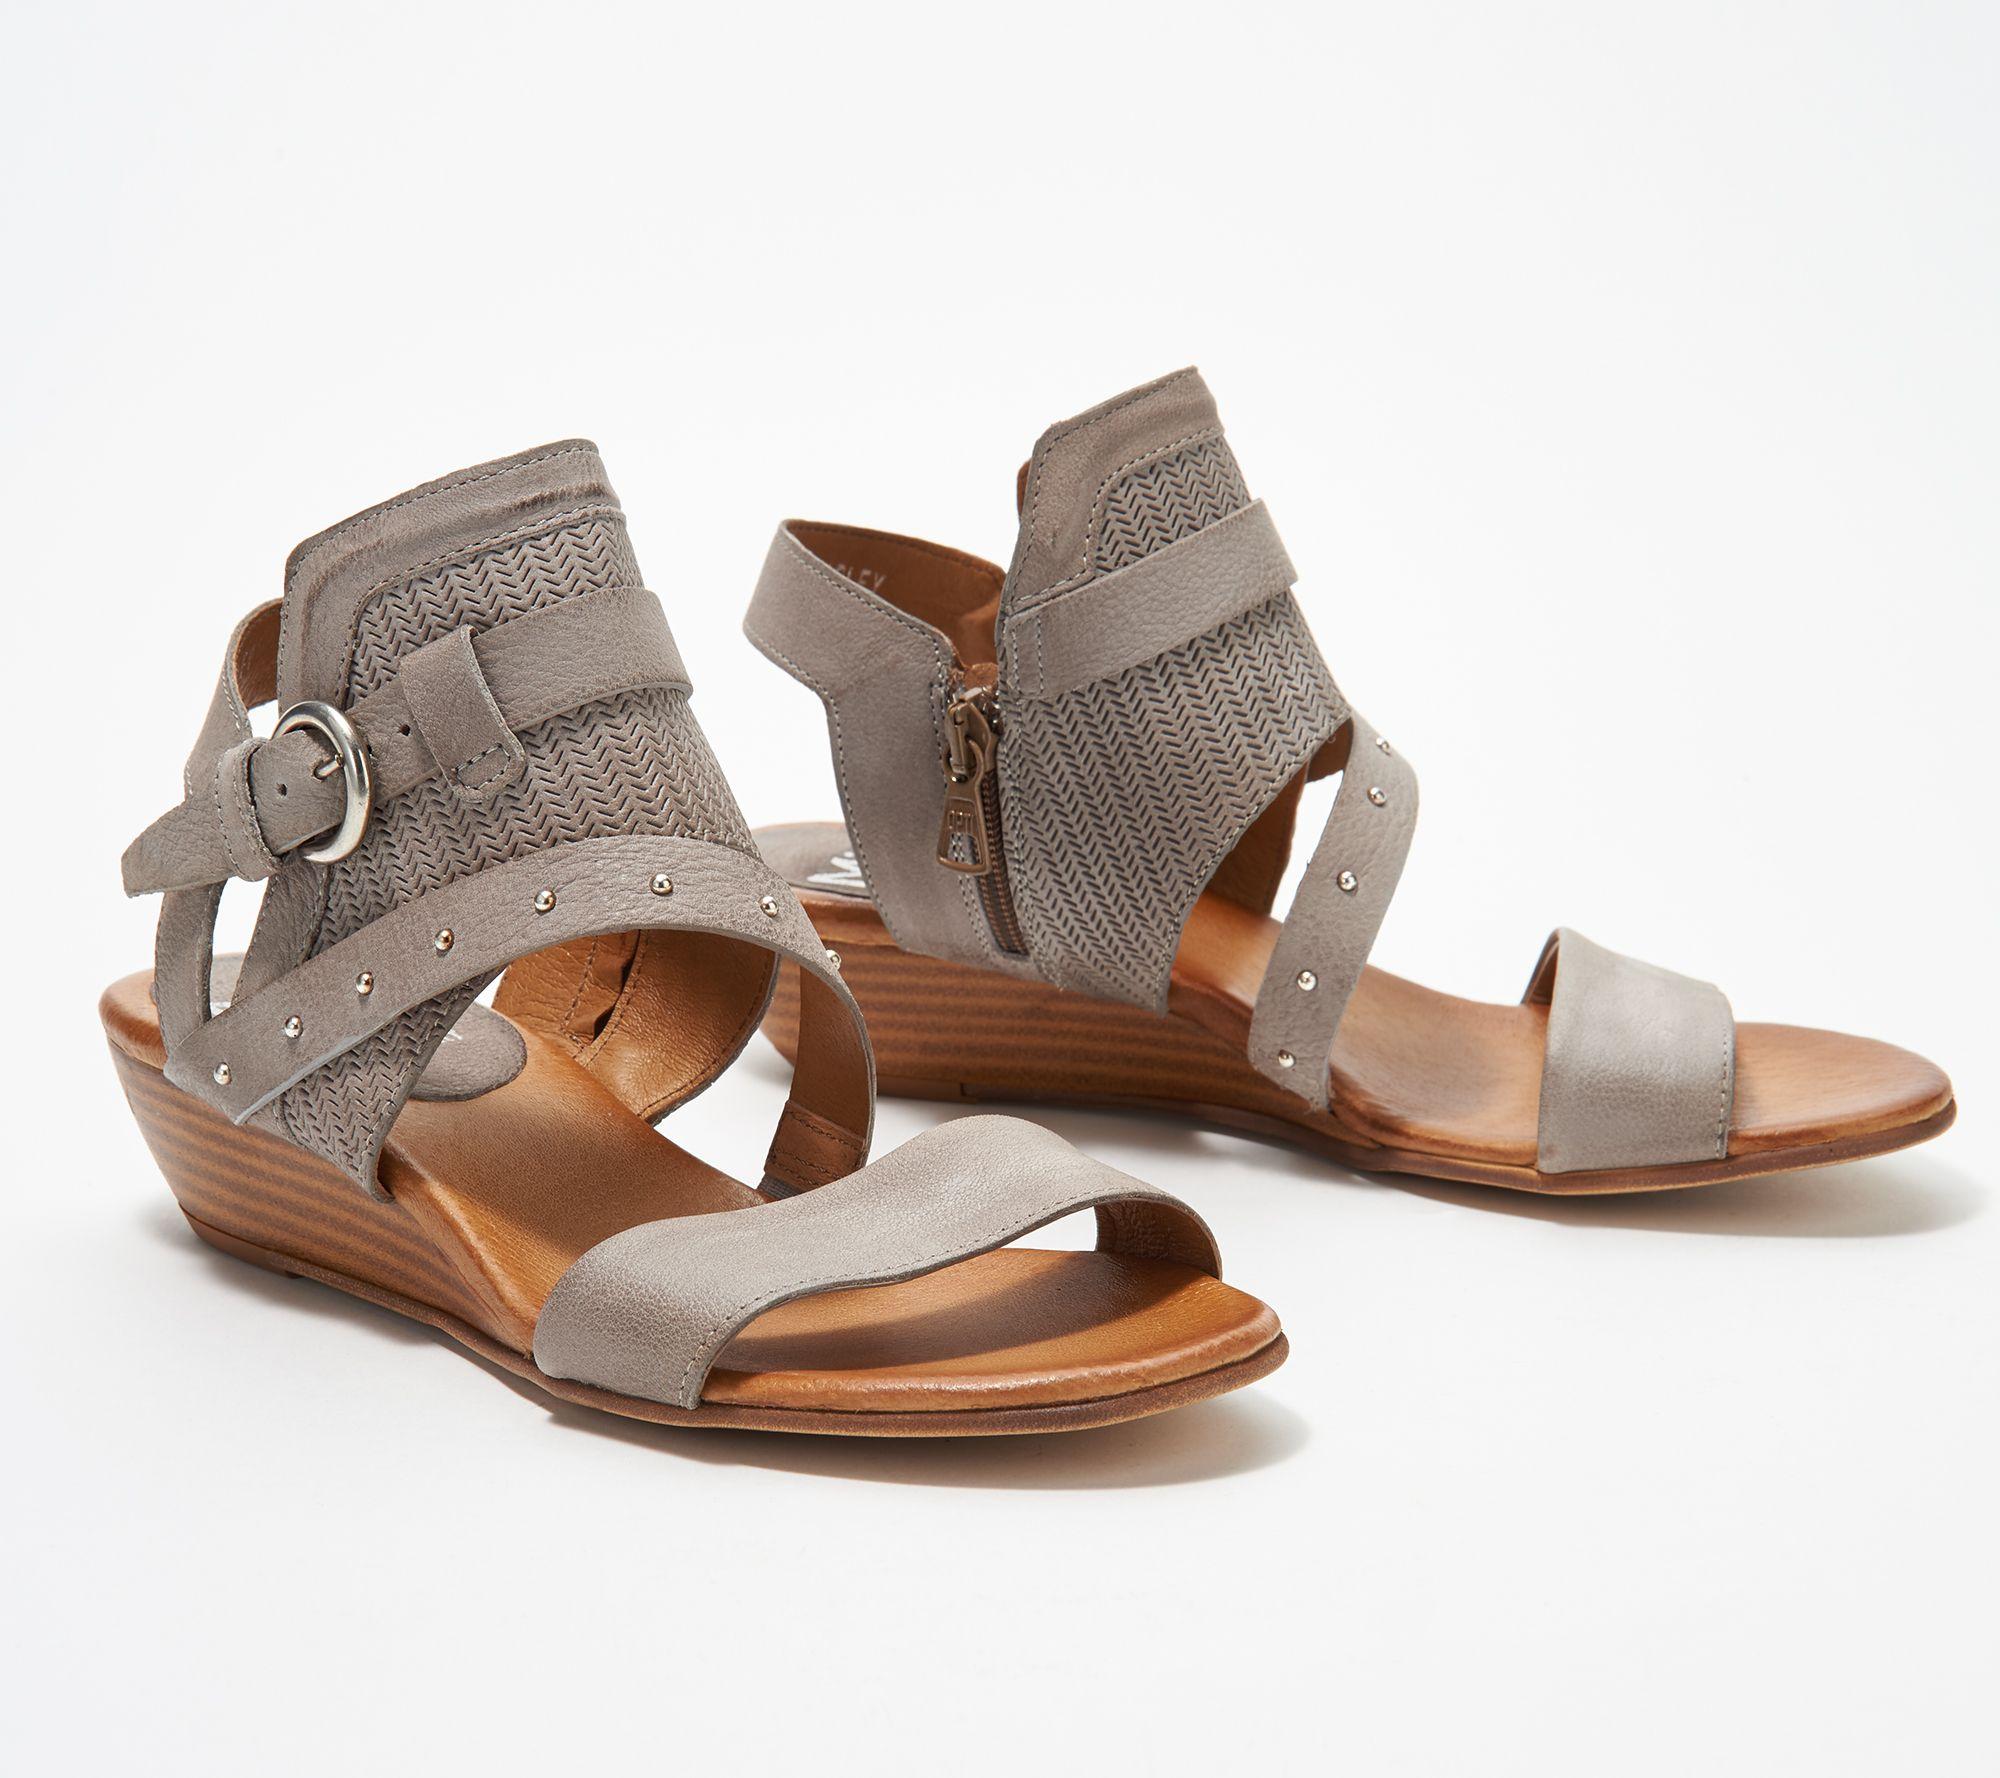 178e780e0fd9 Miz Mooz Leather Buckle Demi-Wedge Sandals - Farley - Page 1 — QVC.com